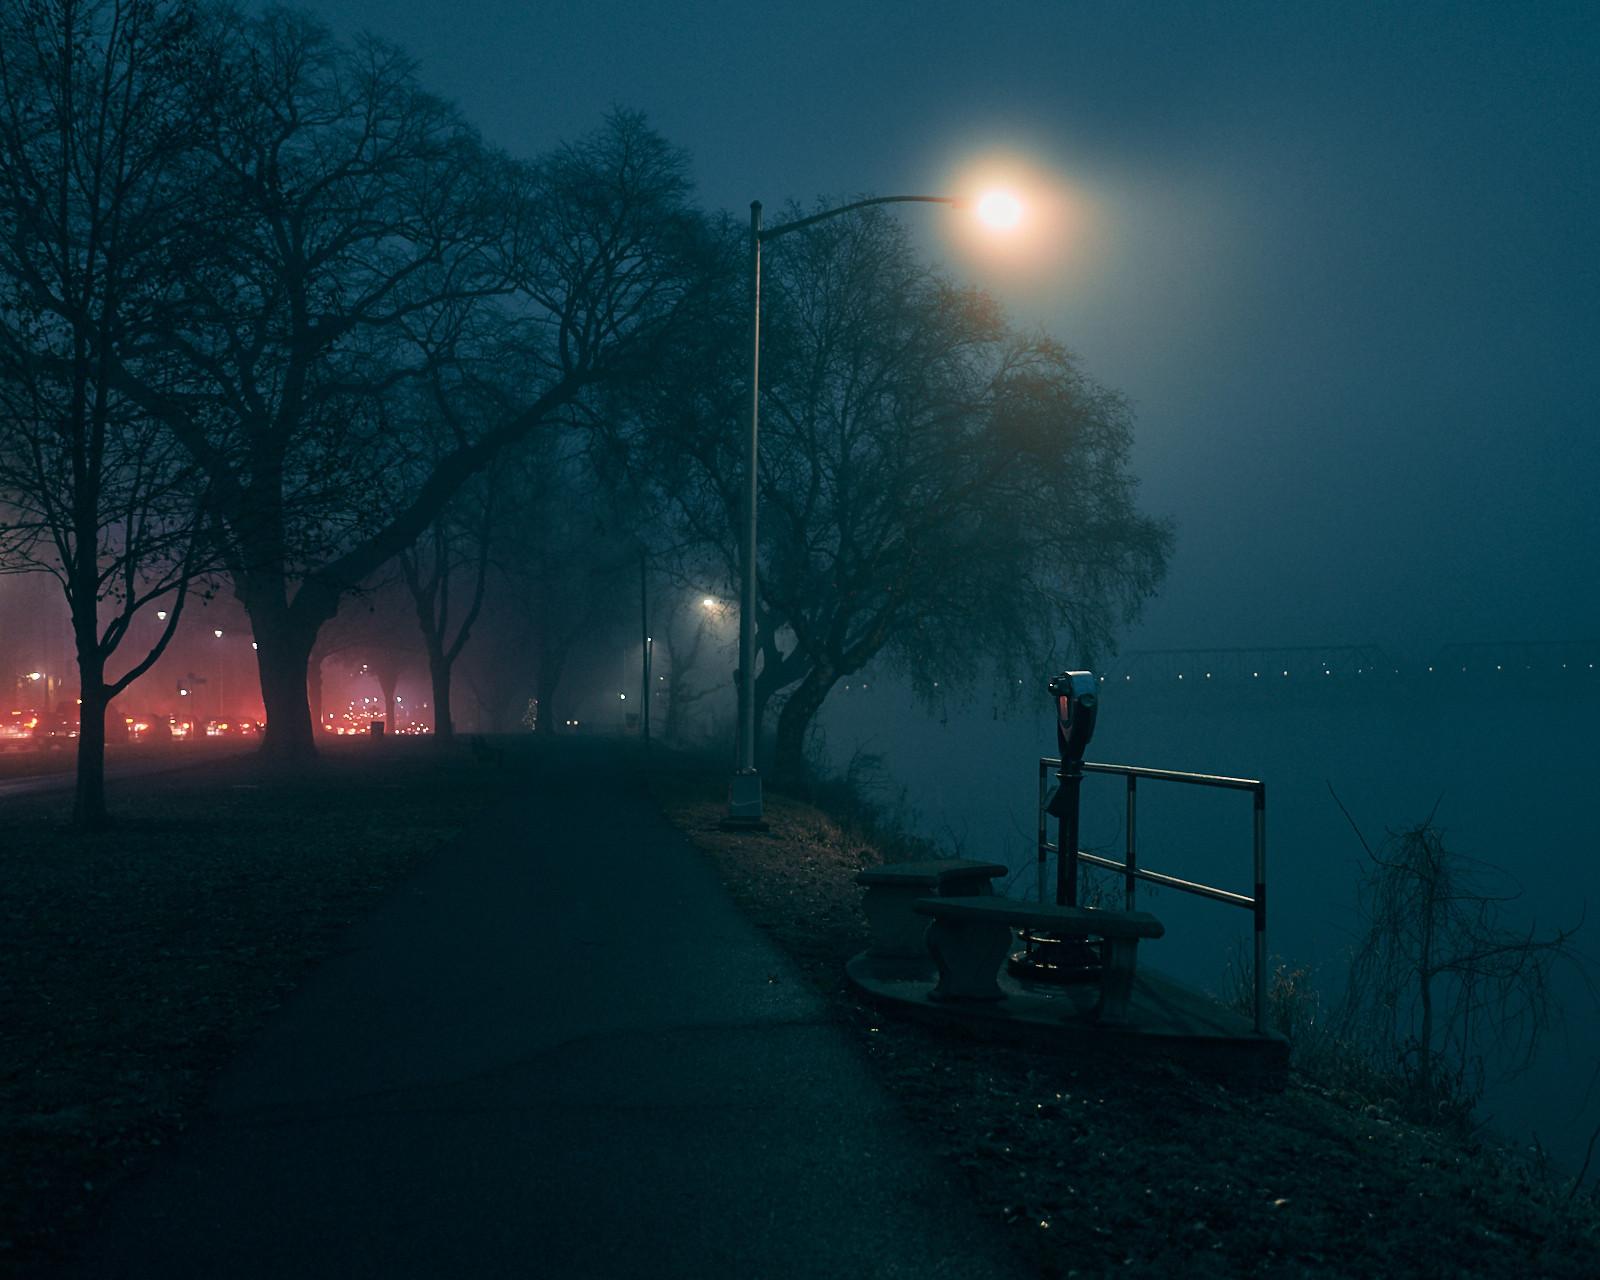 Front Street at Night - Harrisburg, Pennsylvania - fine art photography